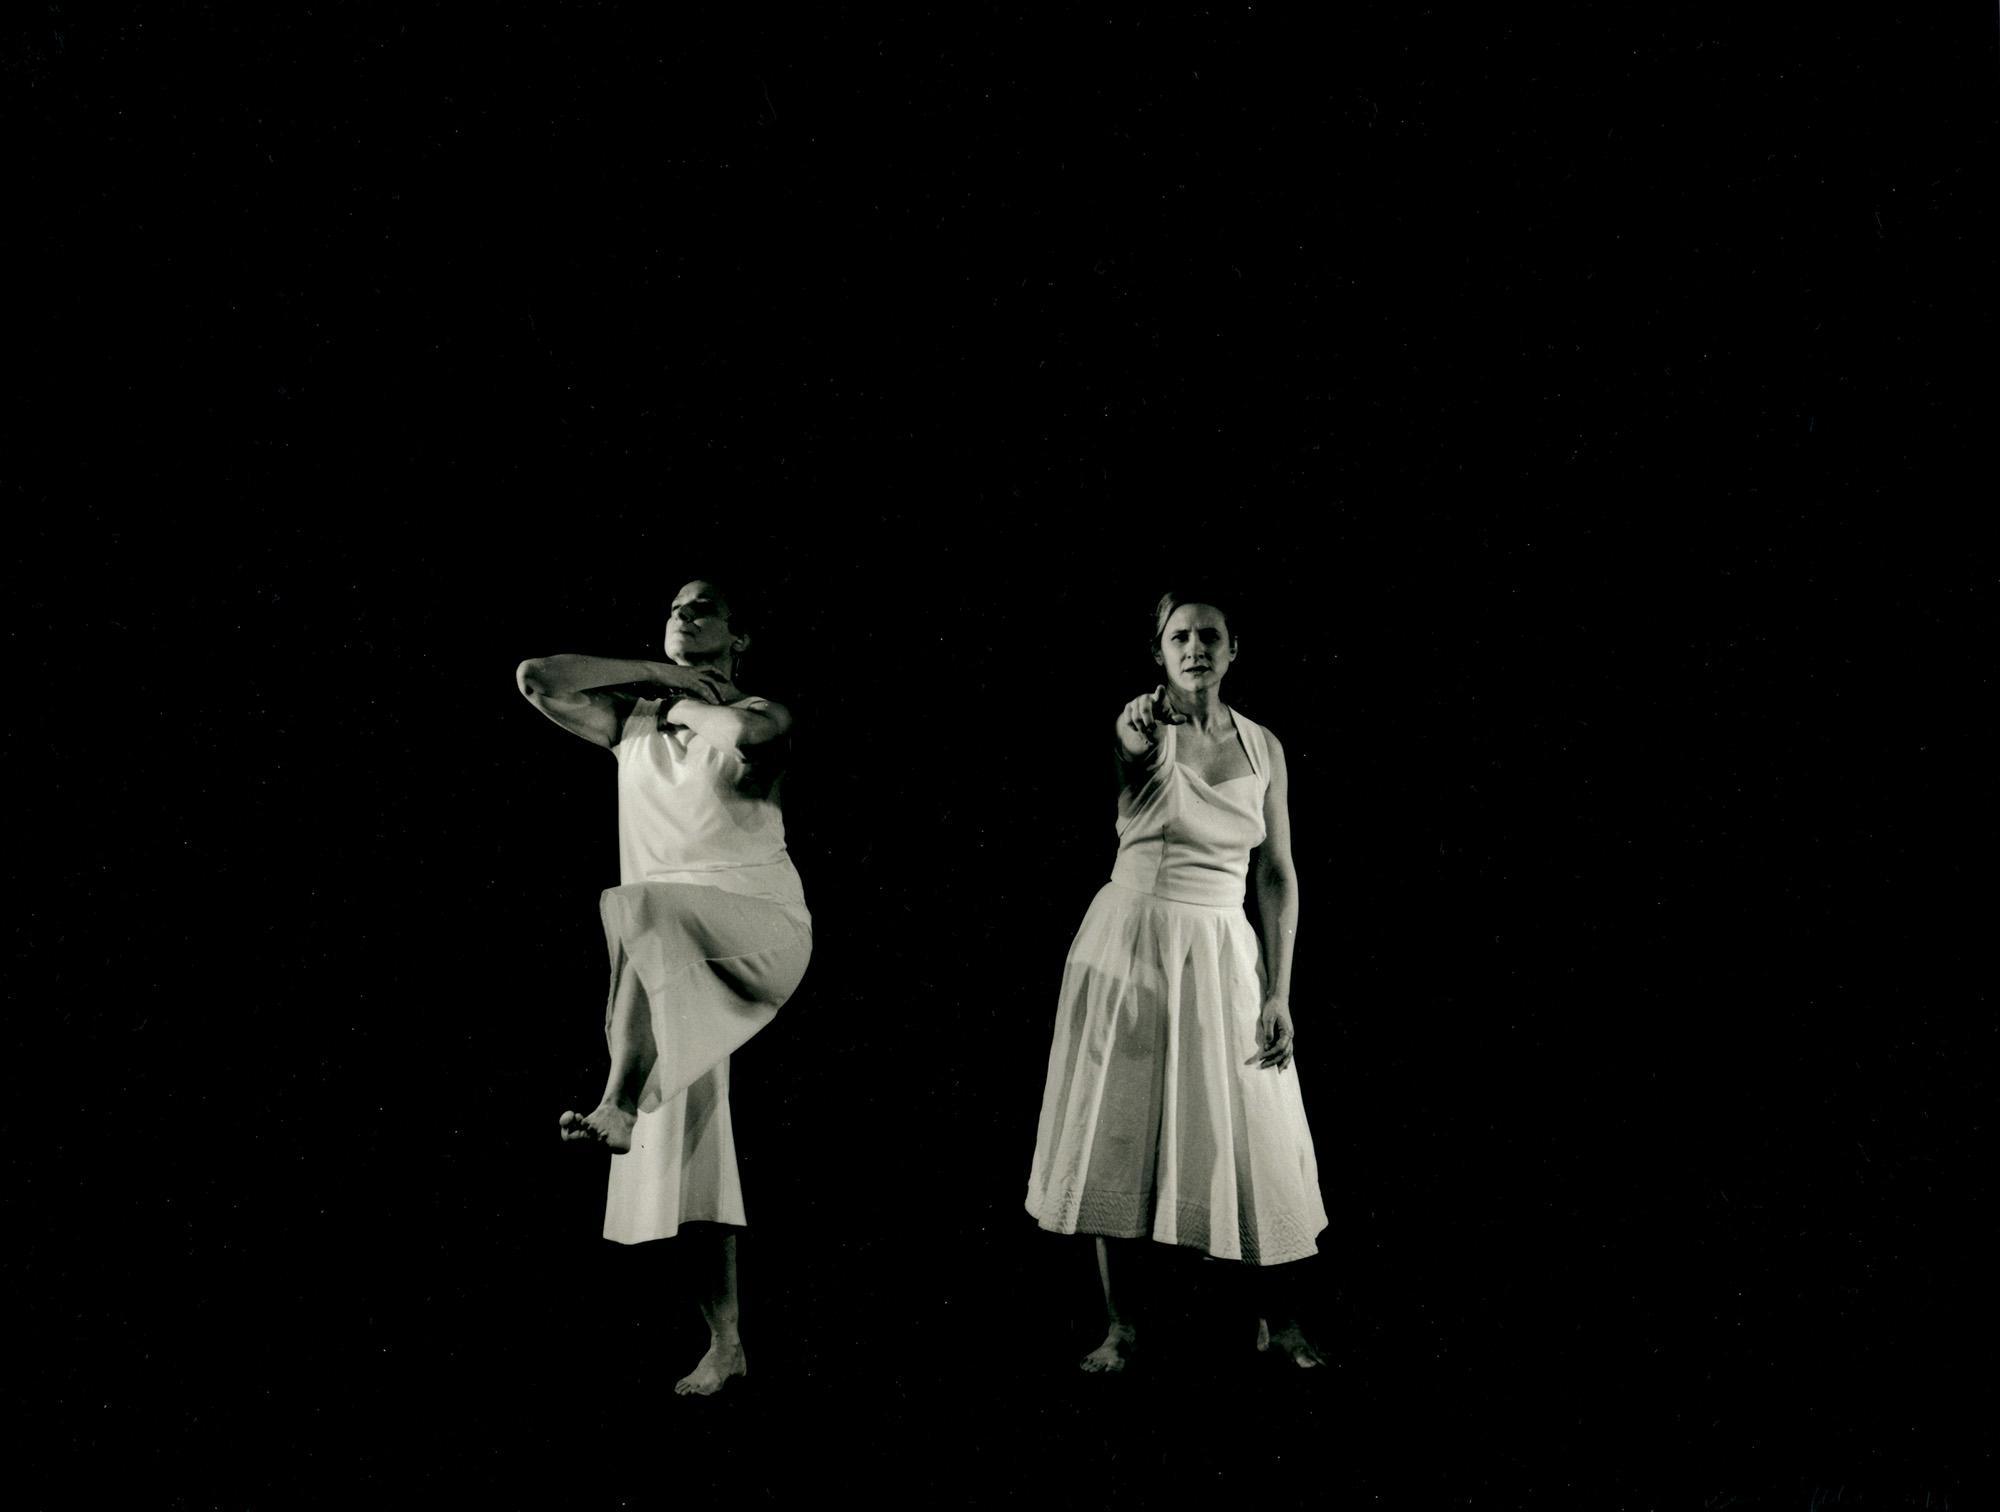 Fiorenza-Menni-Chiara-Lagani-fannyealexander-intervista